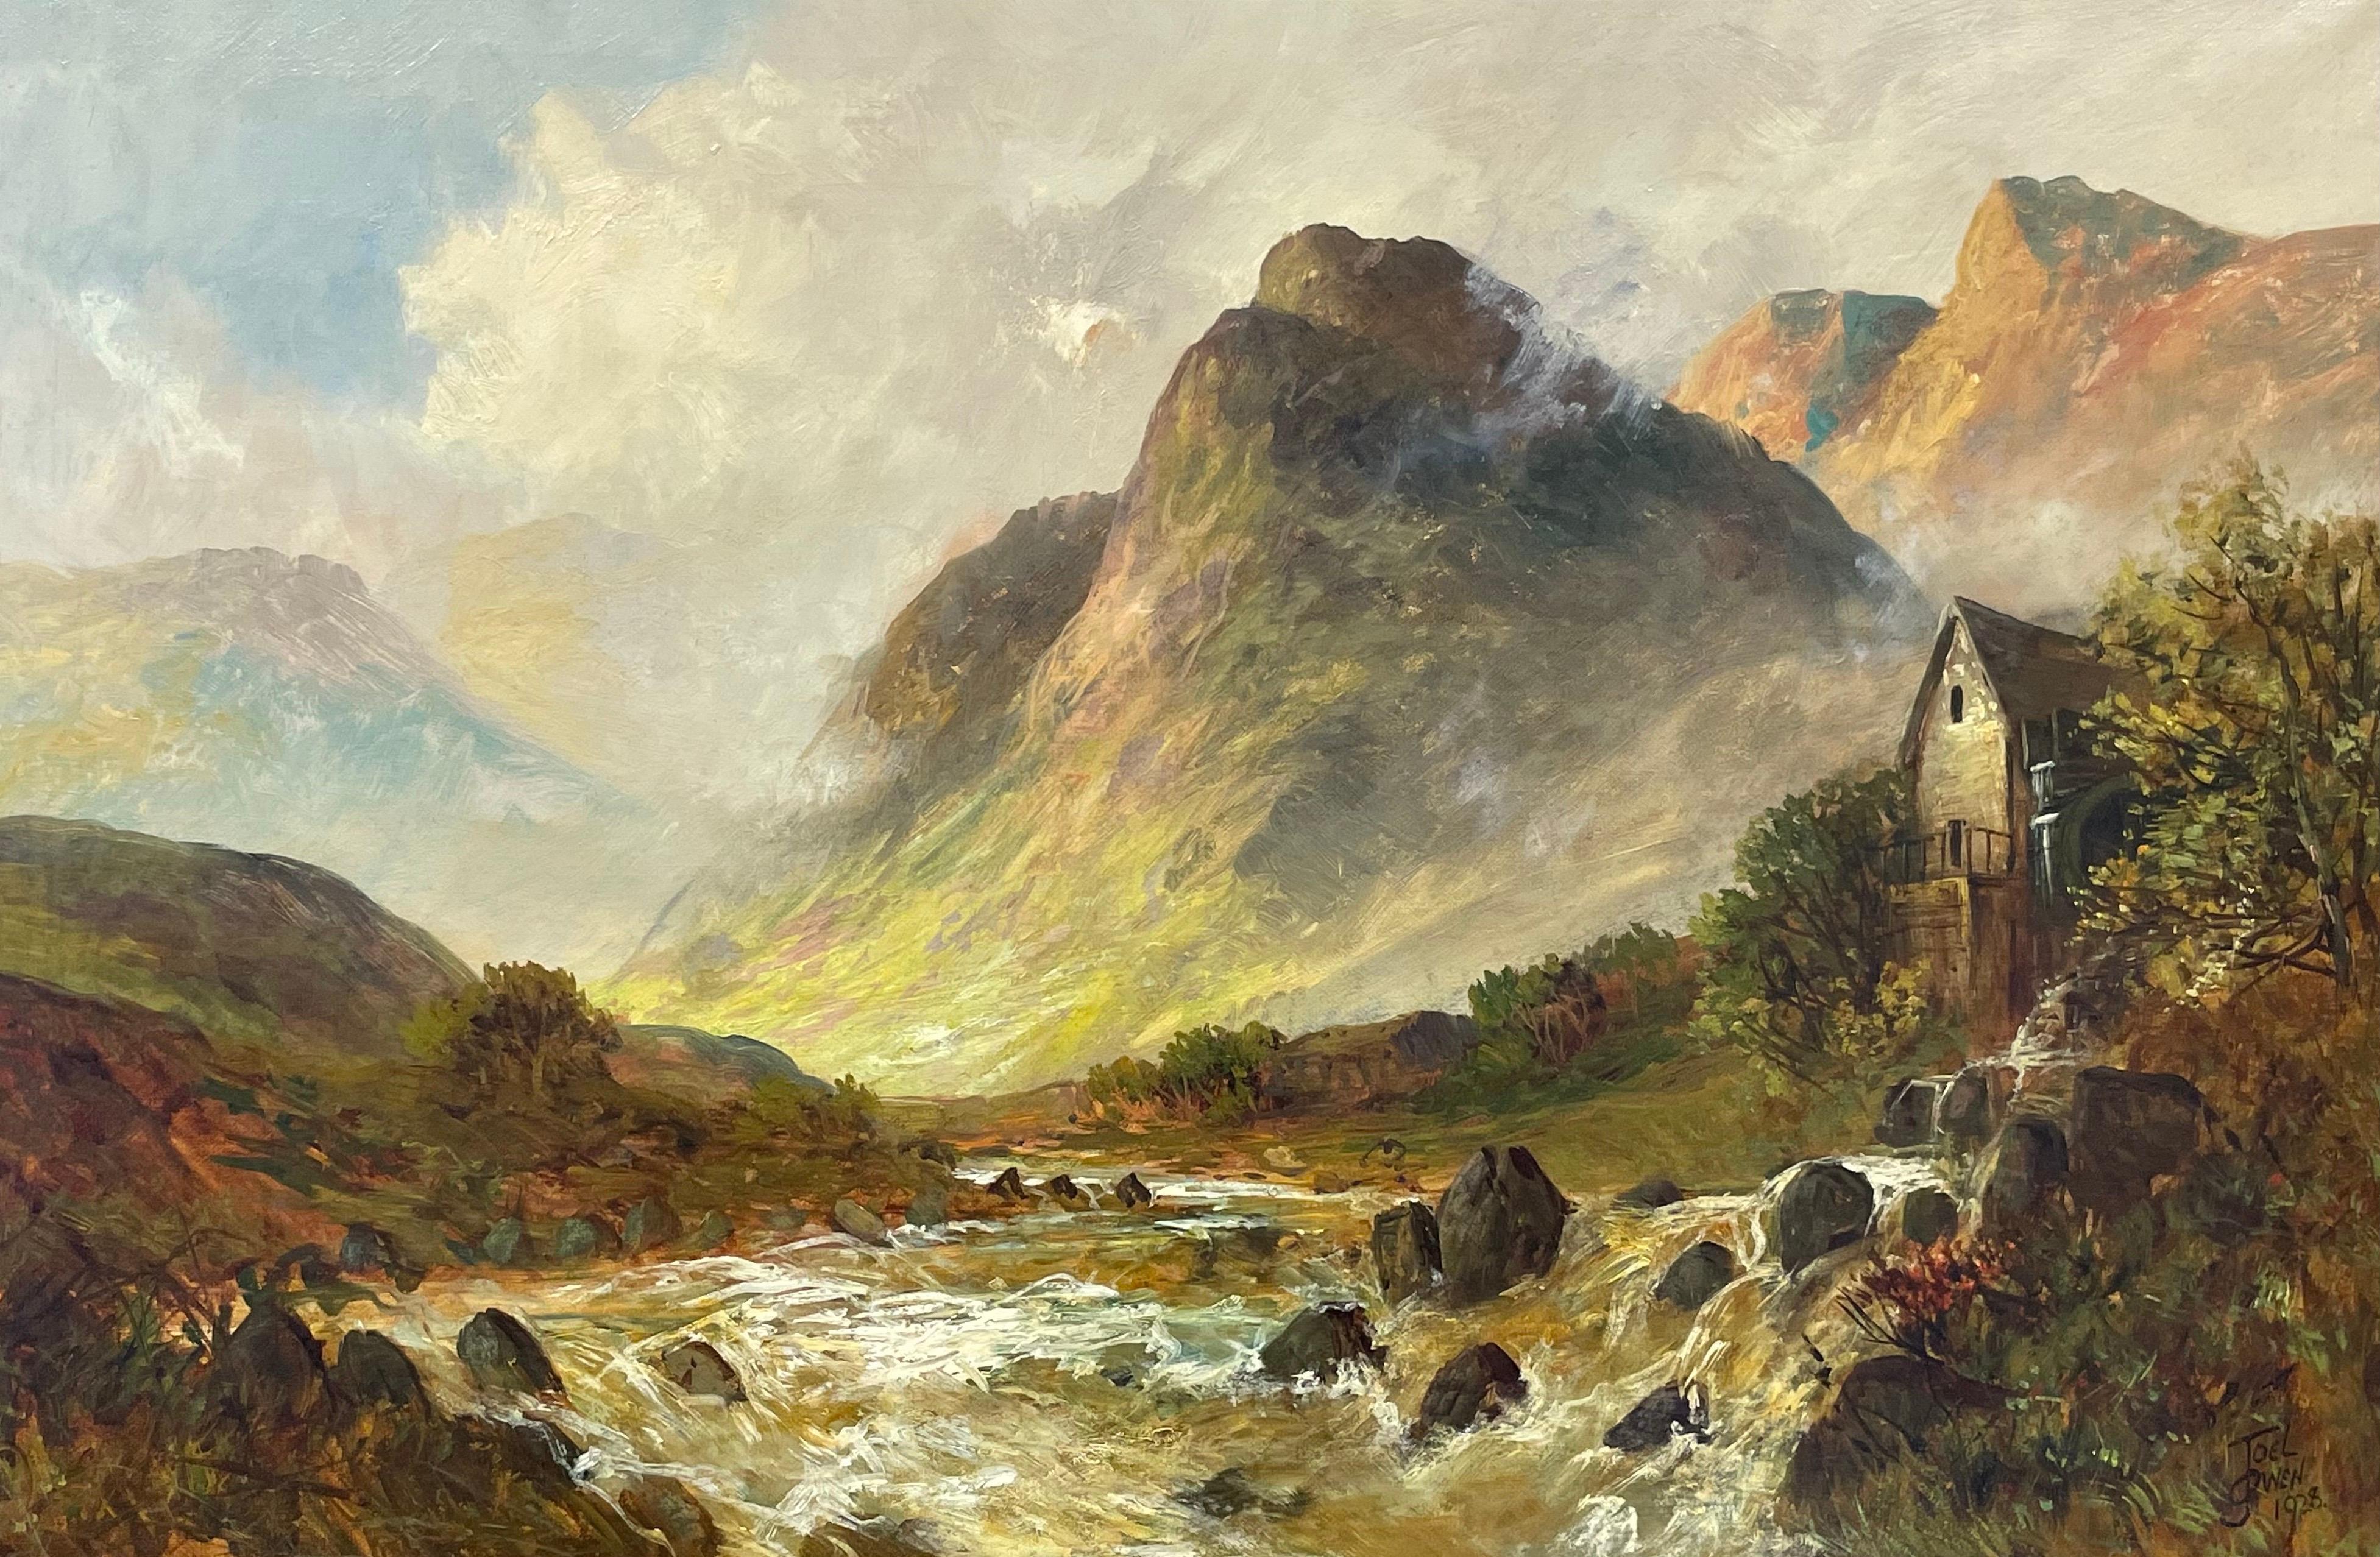 Antique Scottish Highlands Oil Painting Sunrise River Landscape with Mountains